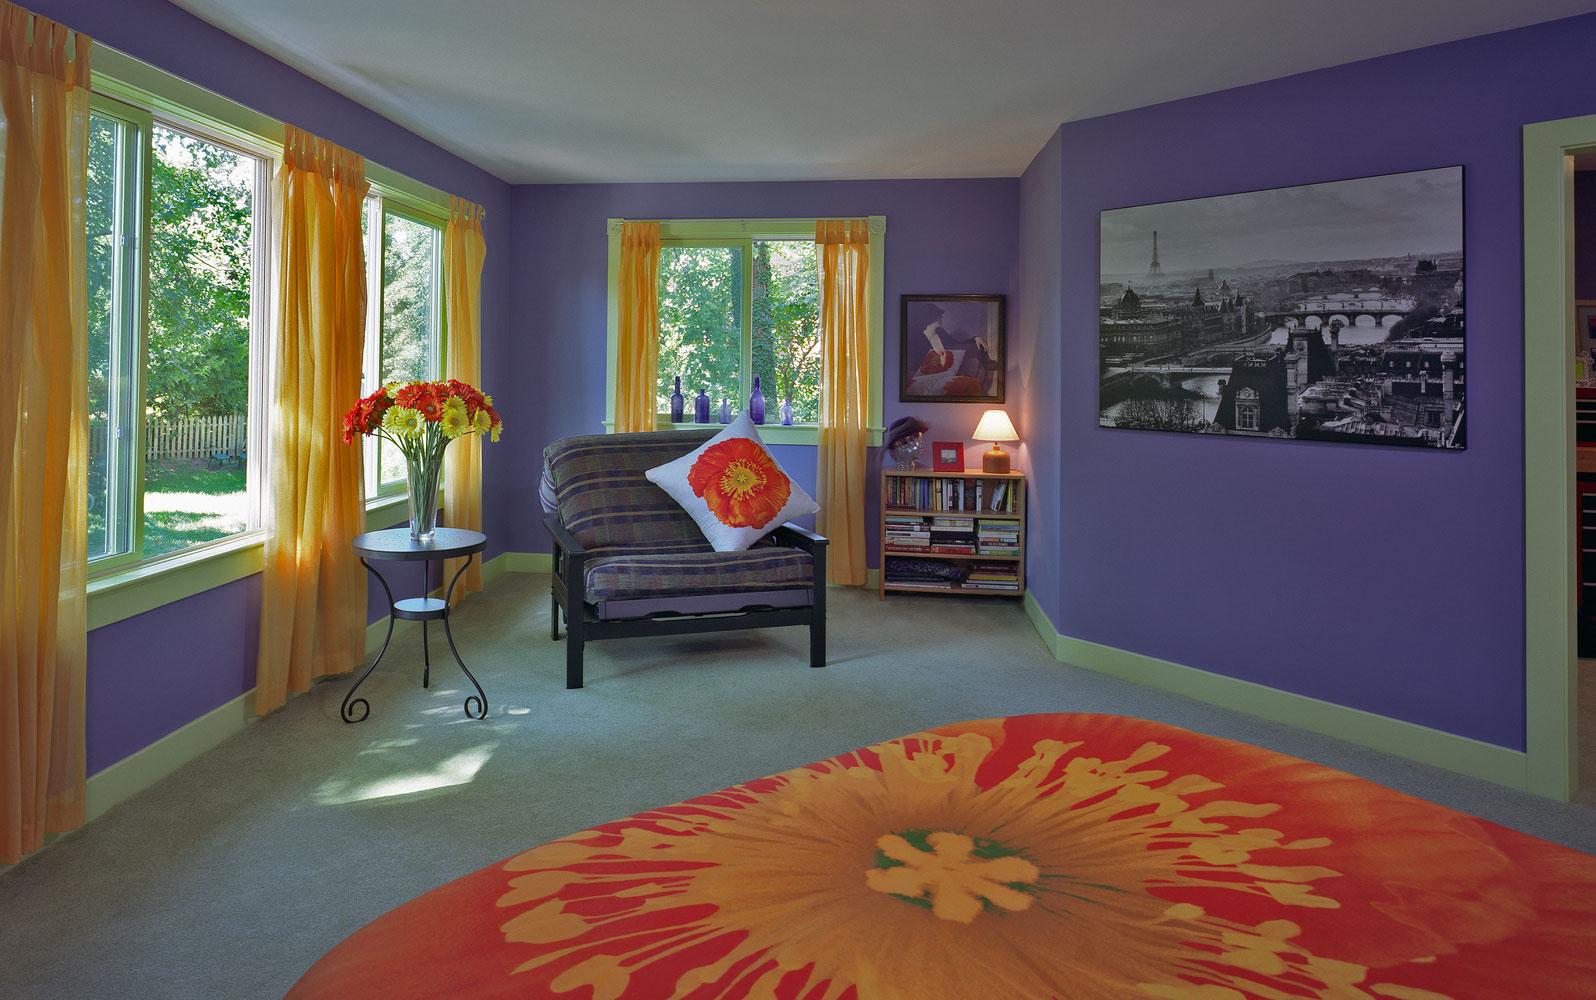 passive solar addition 2nd floor interior room